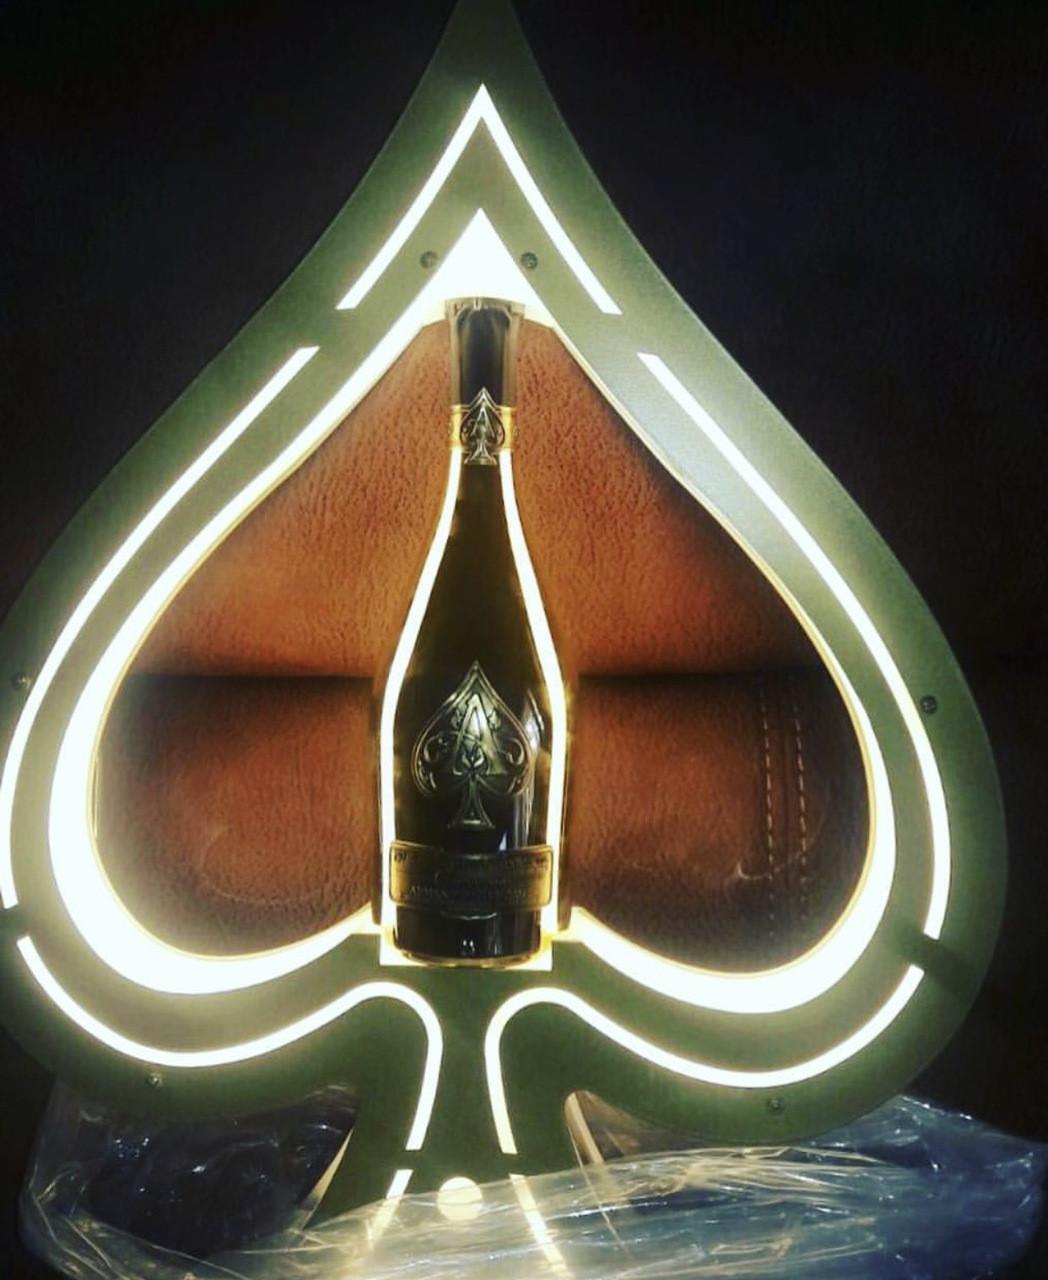 Champagne Bottle presenter